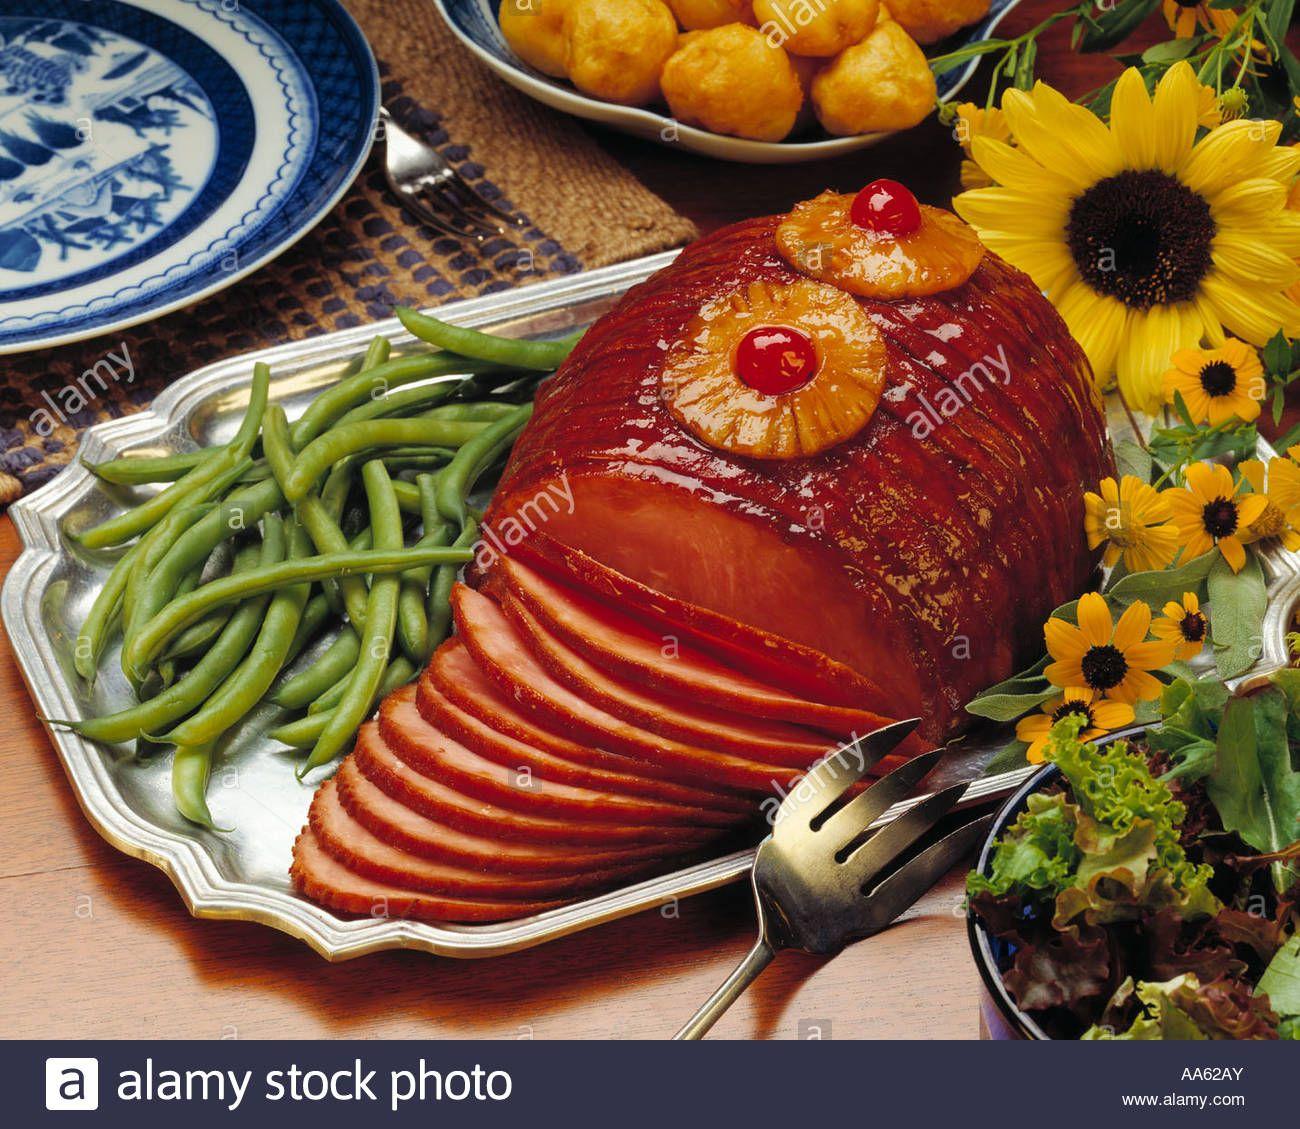 Fully Cooked Whole Spiral Ham Dinner Platter Garnish Culinary ... | Ham dinner